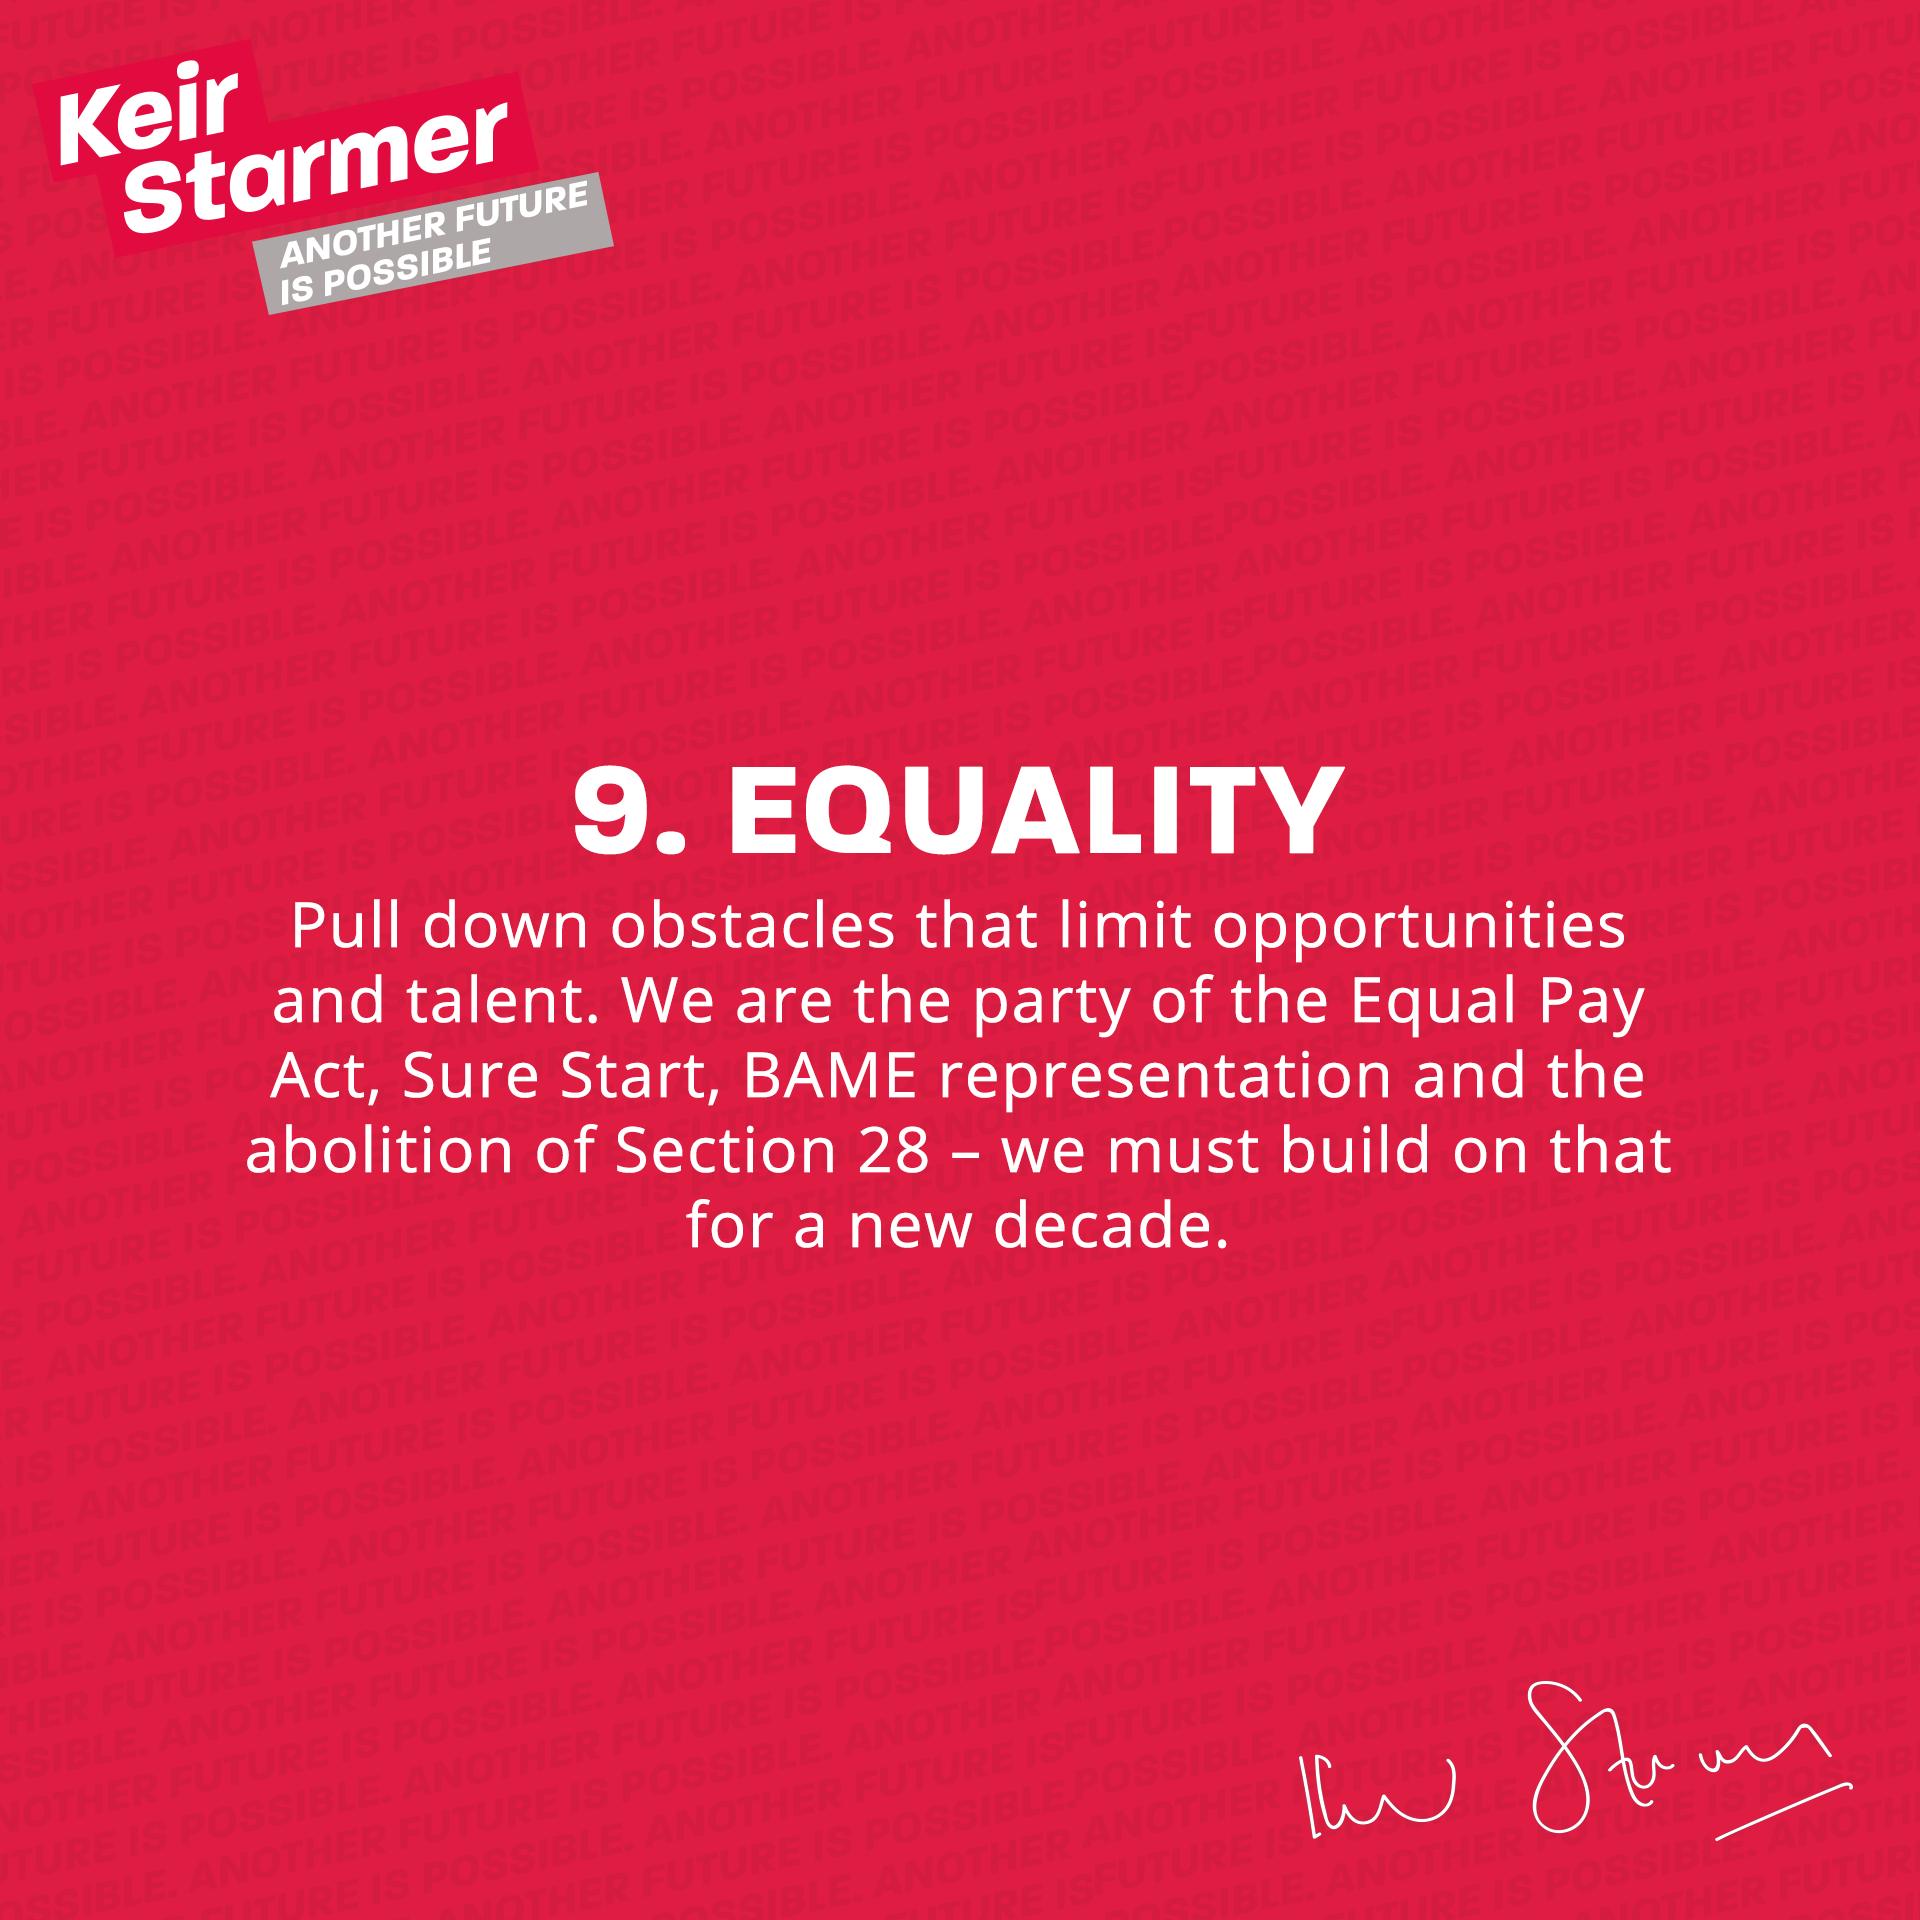 Keir Starmer - 9 Equality - Leadership Pledge Graphic